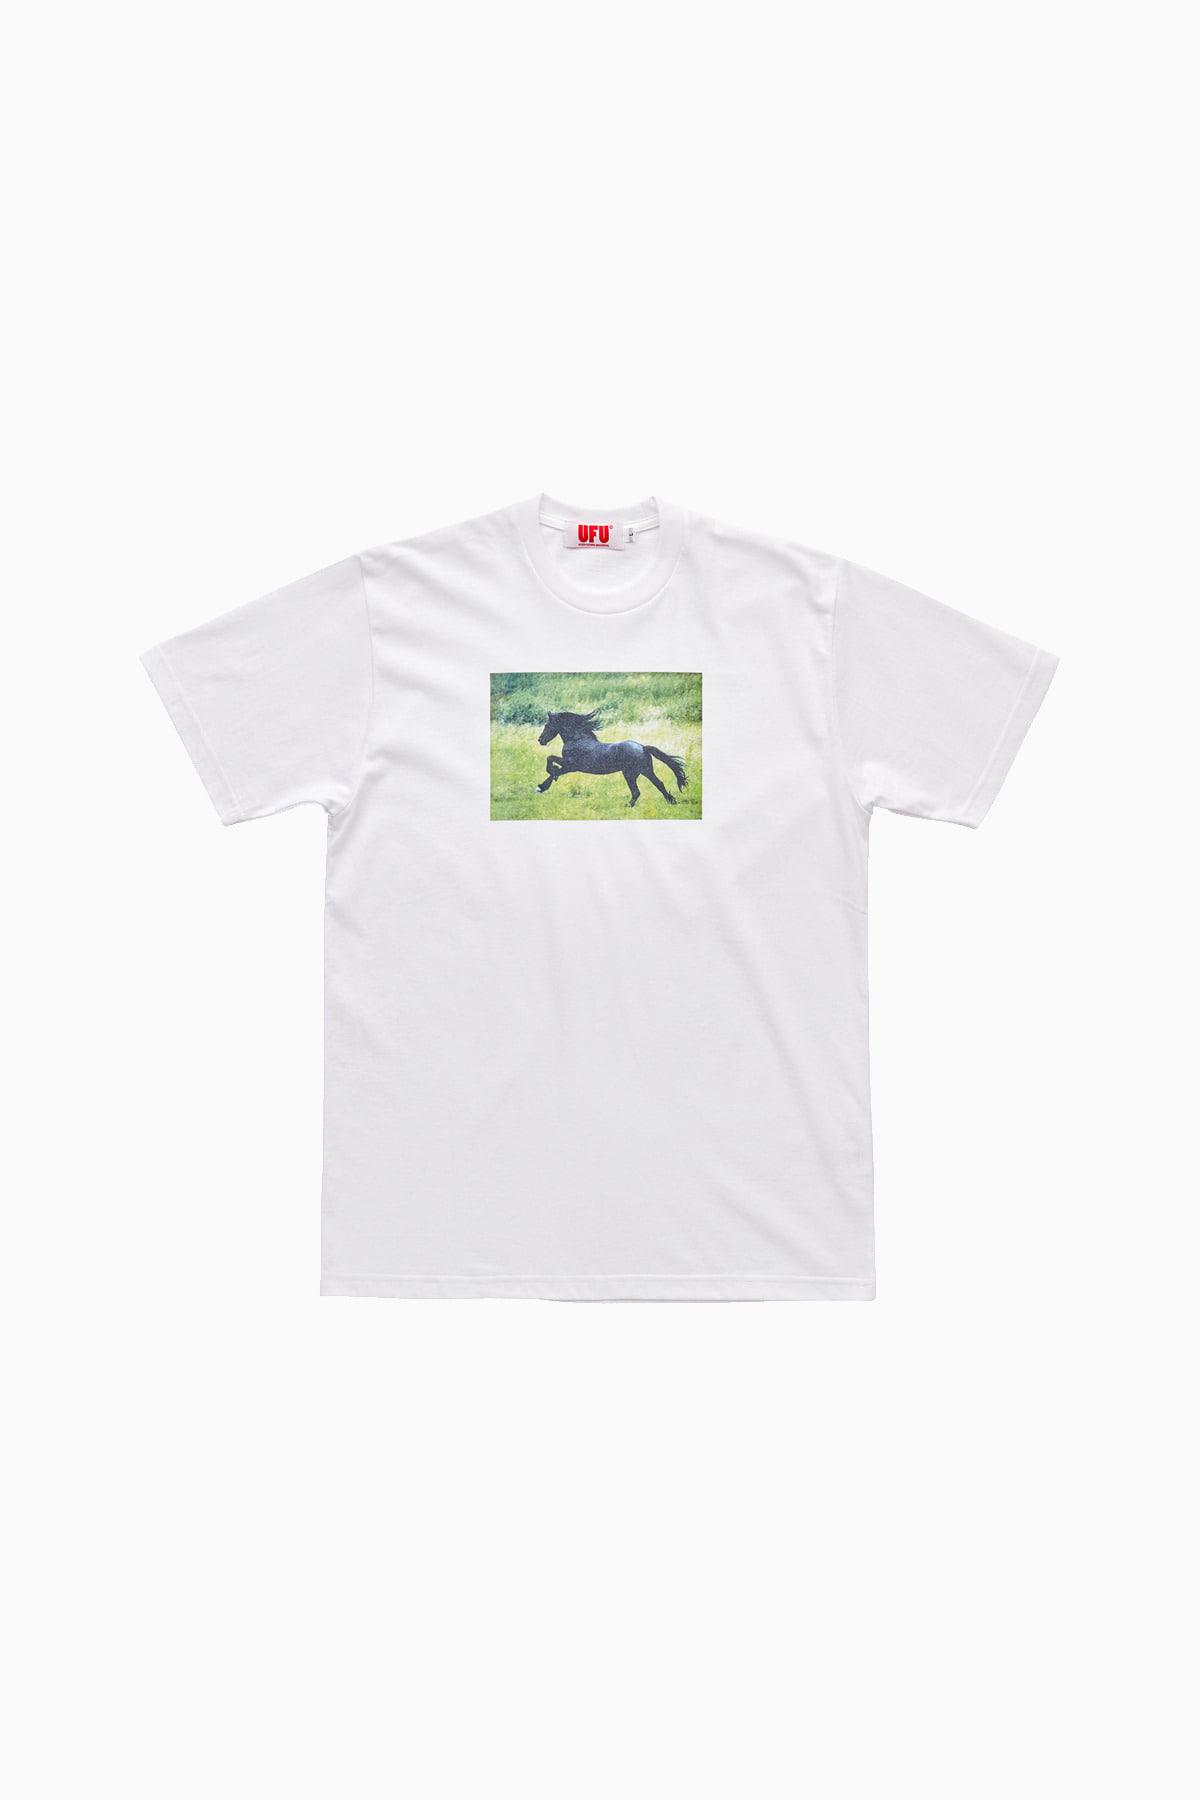 HORSE T-SHIRT_WHITE